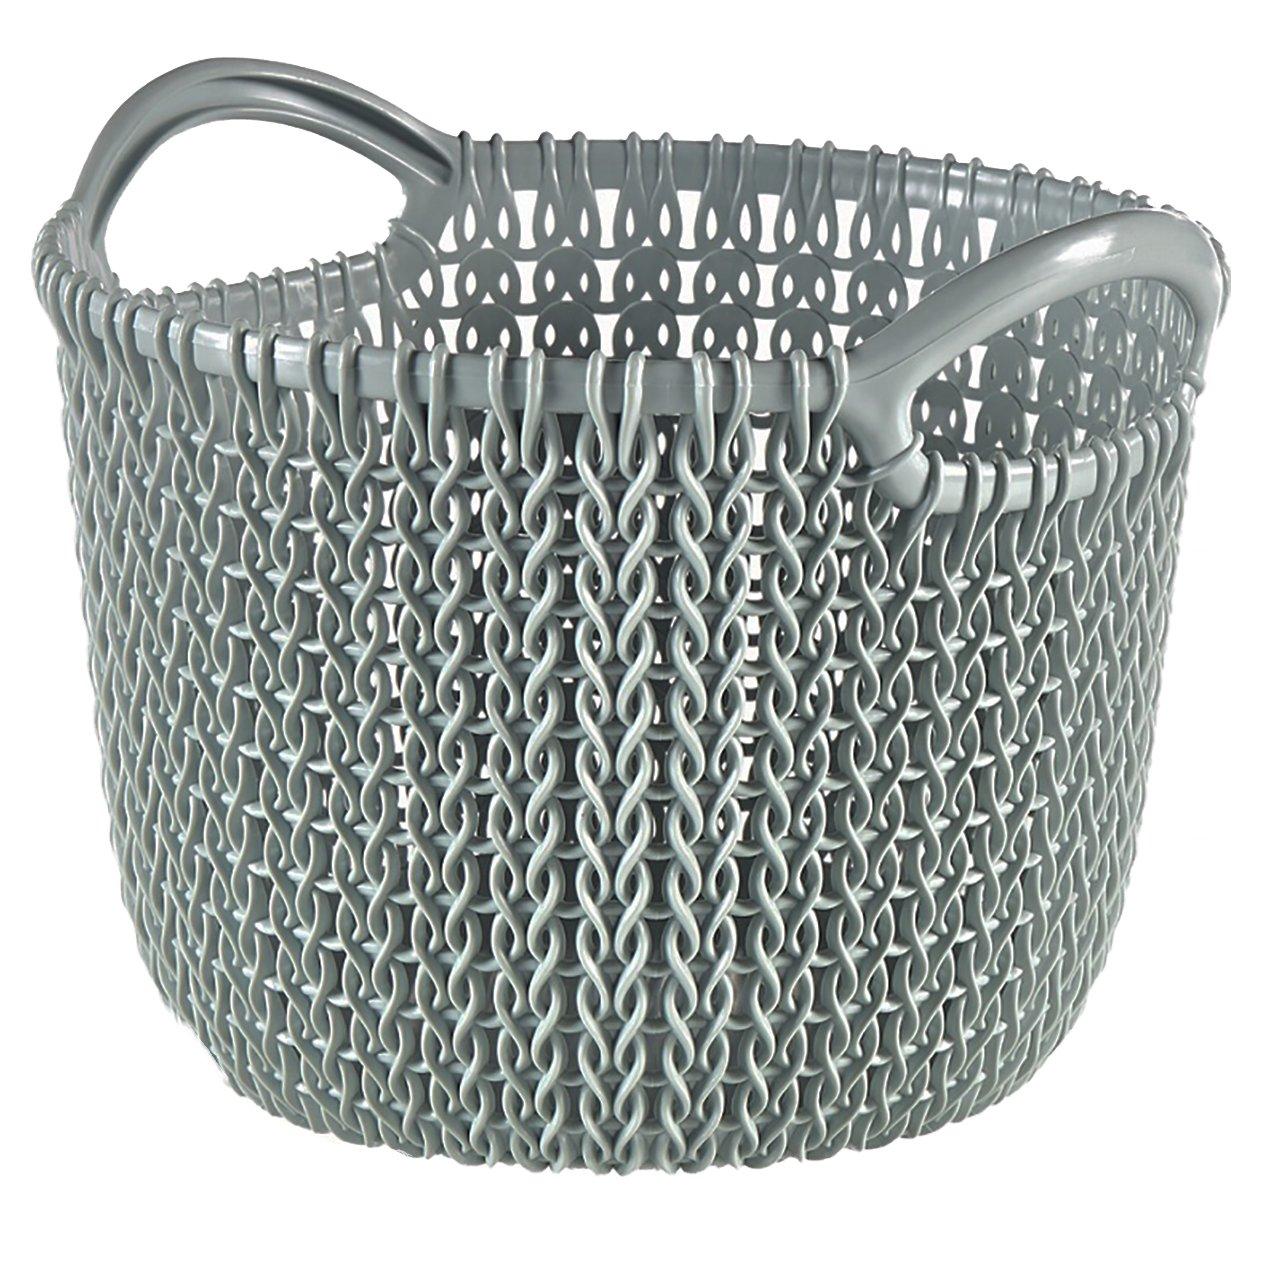 Curver Cesta Knit Redonda XS ~3L, Blanco Oasis, 18.2x17.6x13.7 cm, 230003